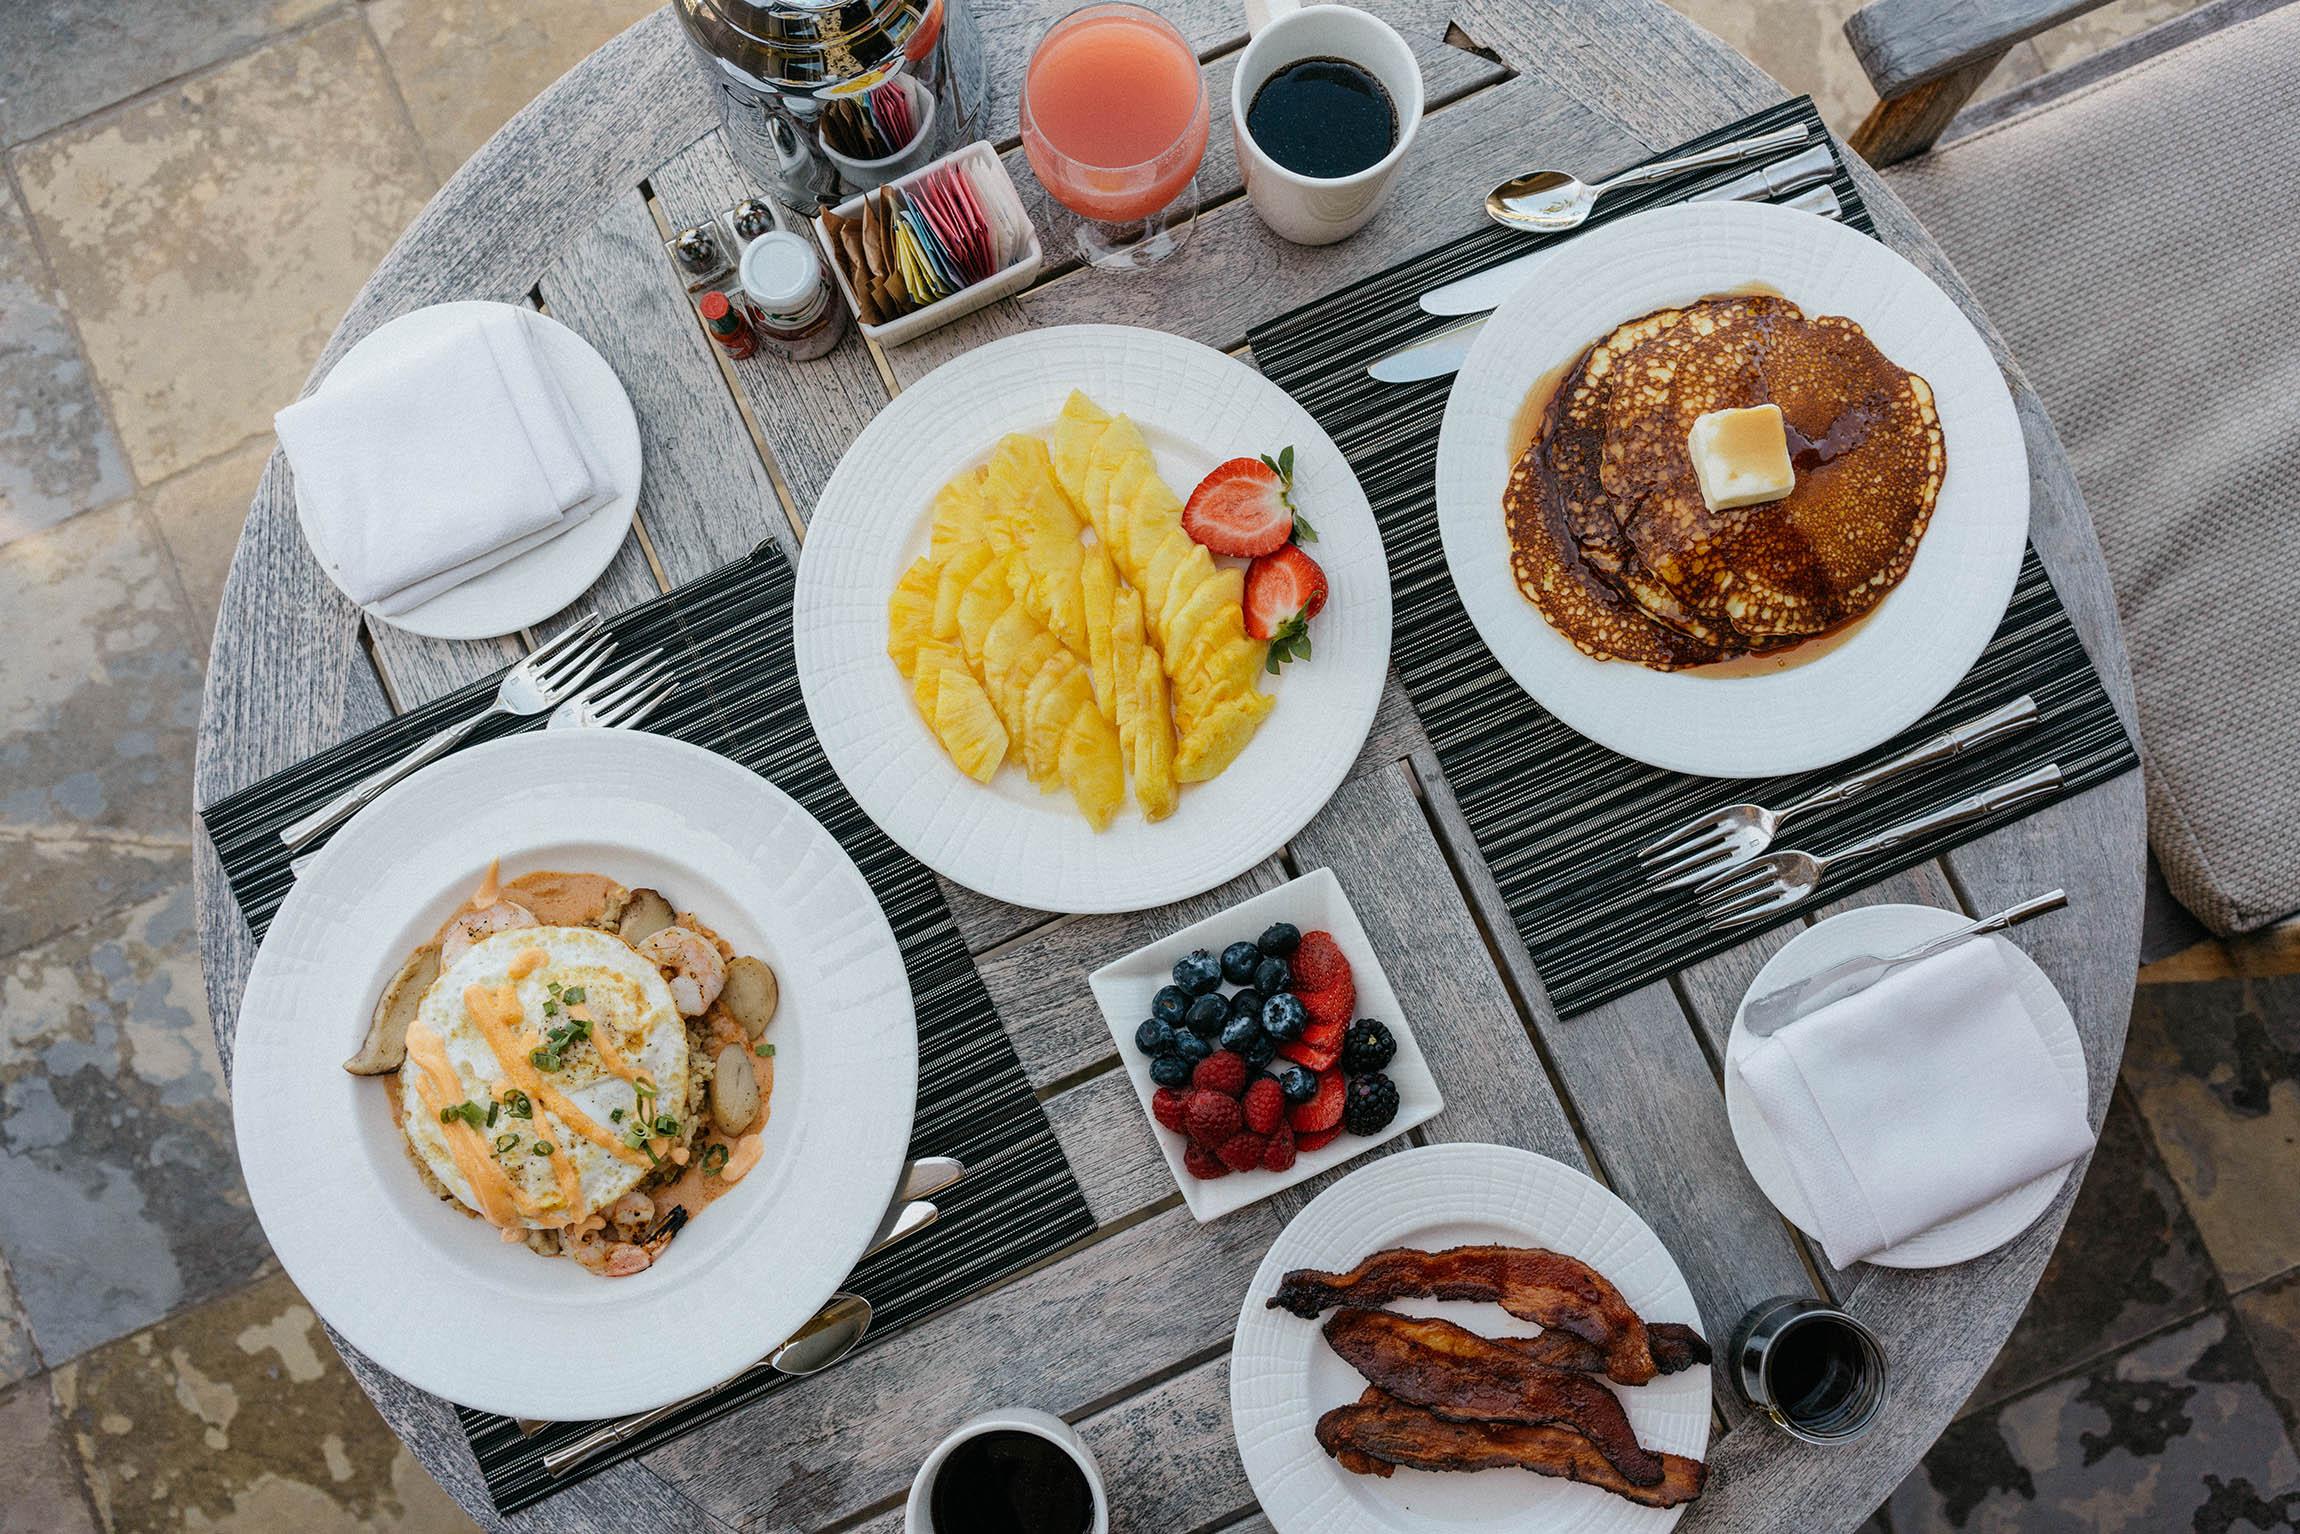 In-room breakfast the next morning of Hawaiian Loco Moco, Pineapple, and Lemon Ricotta Pancakes